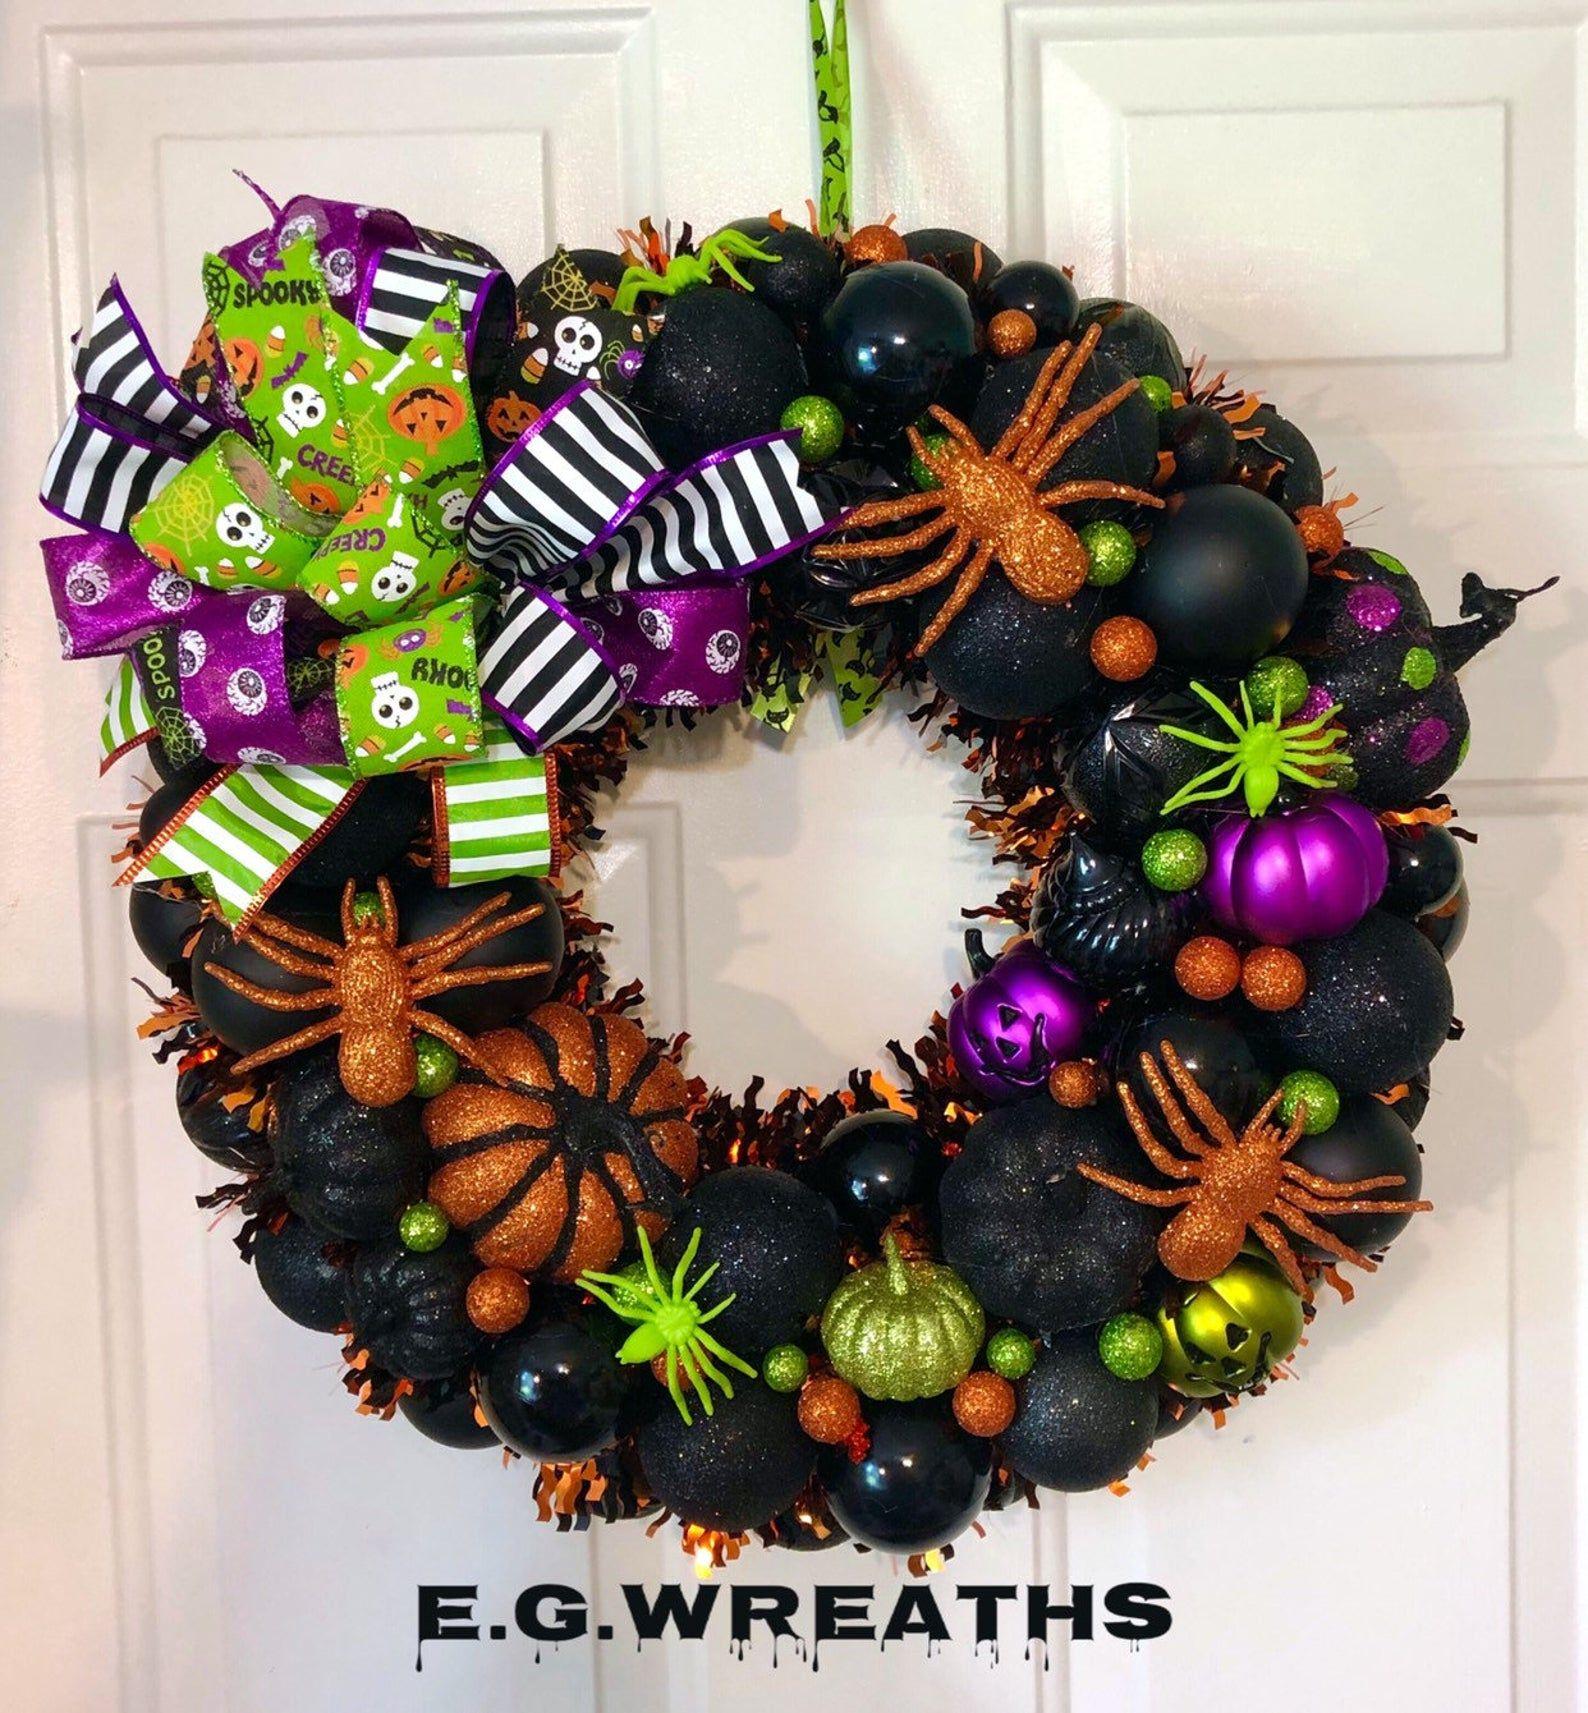 Halloween Ornament Wreath Ornament Wreath Halloween Etsy Halloween Ornament Wreath Handmade Halloween Decorations Wreaths